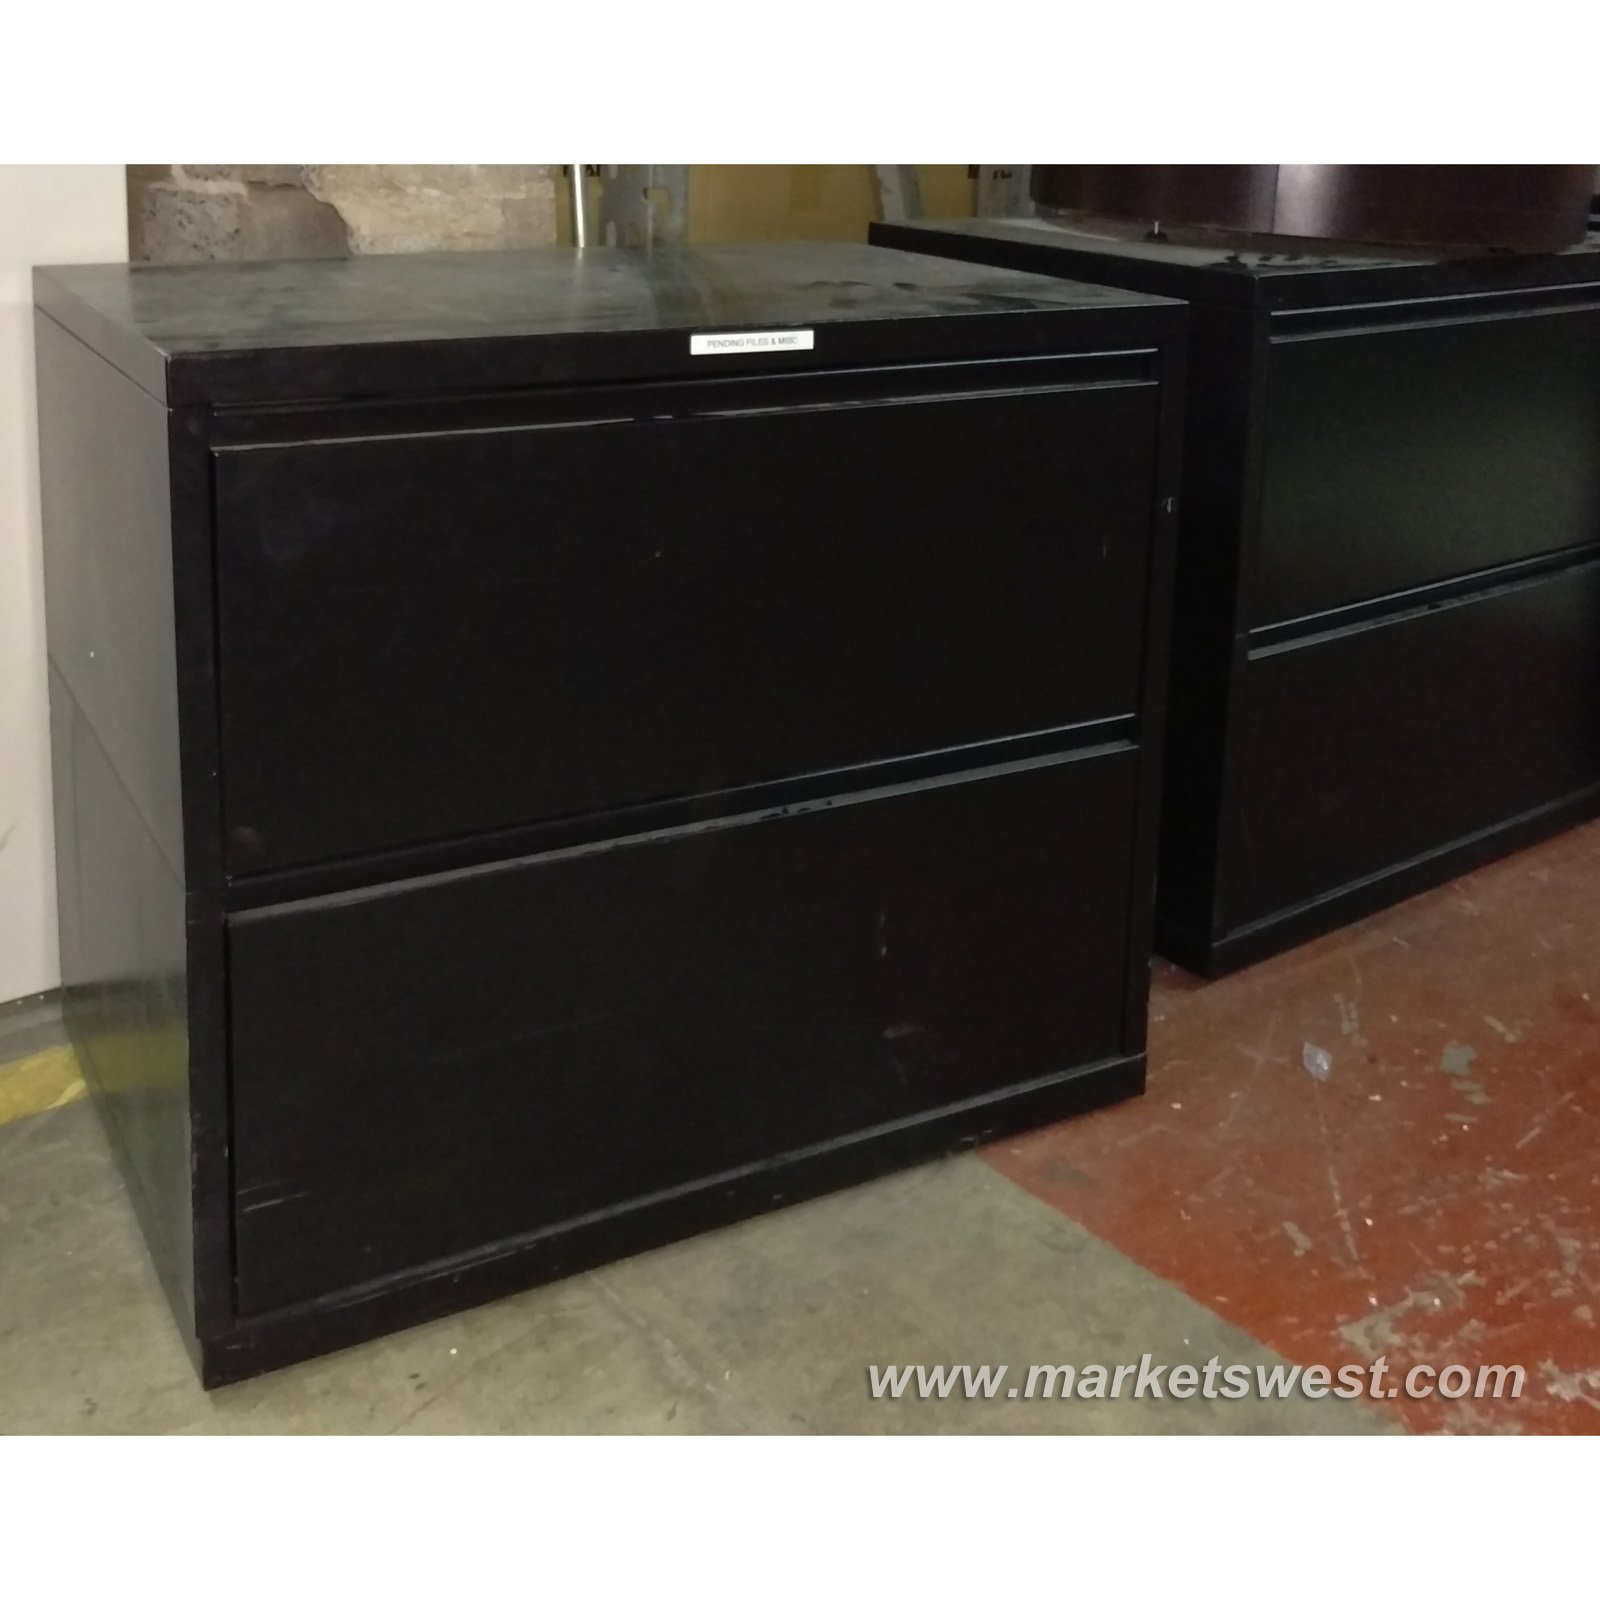 2 drawer black meridian herman miller lateral file for Meridian cabinets